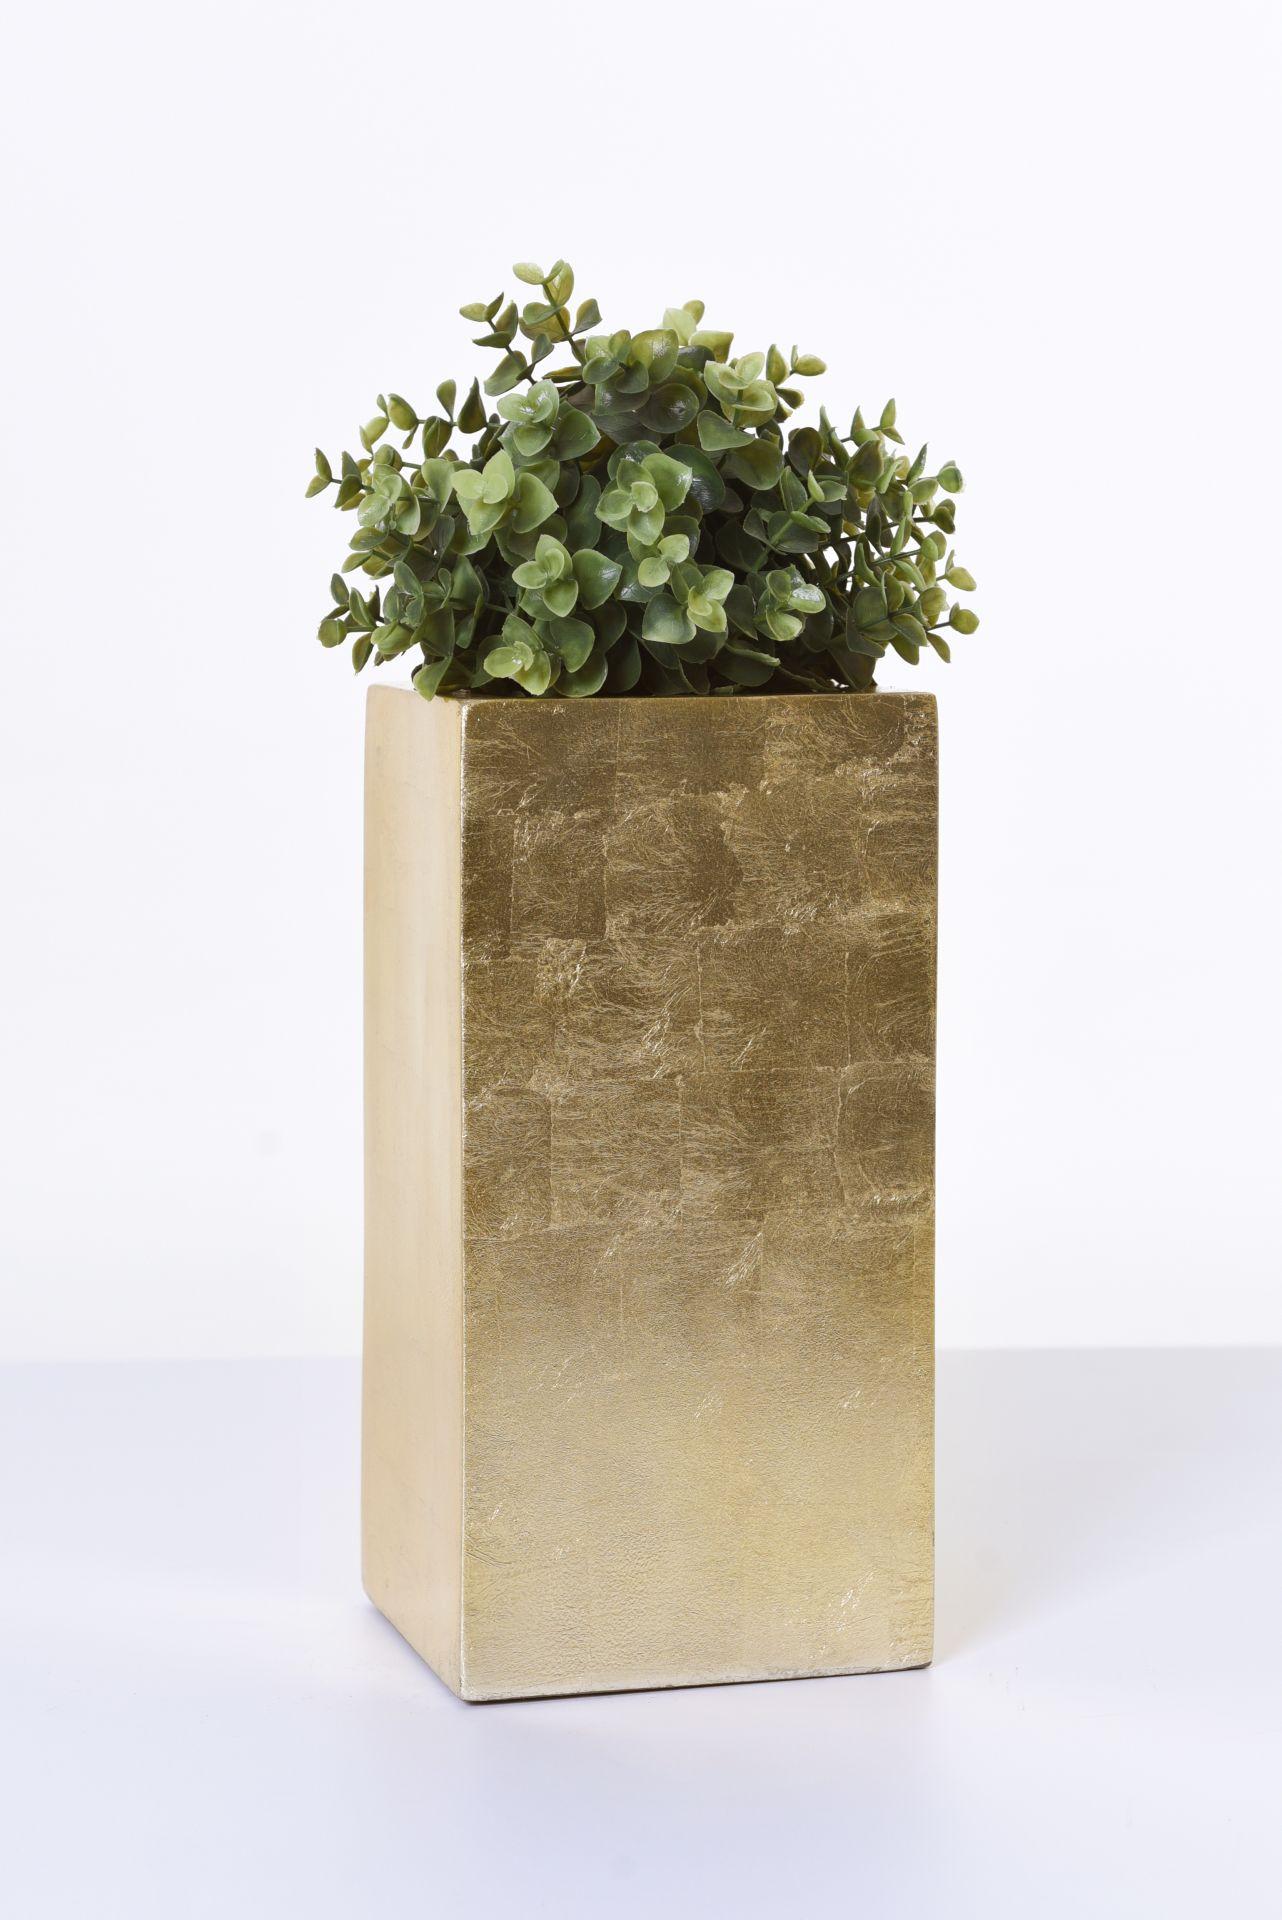 pflanzk bel blumenk bel blumentopf fiberglas block 30 cm gold hochglanz ebay. Black Bedroom Furniture Sets. Home Design Ideas